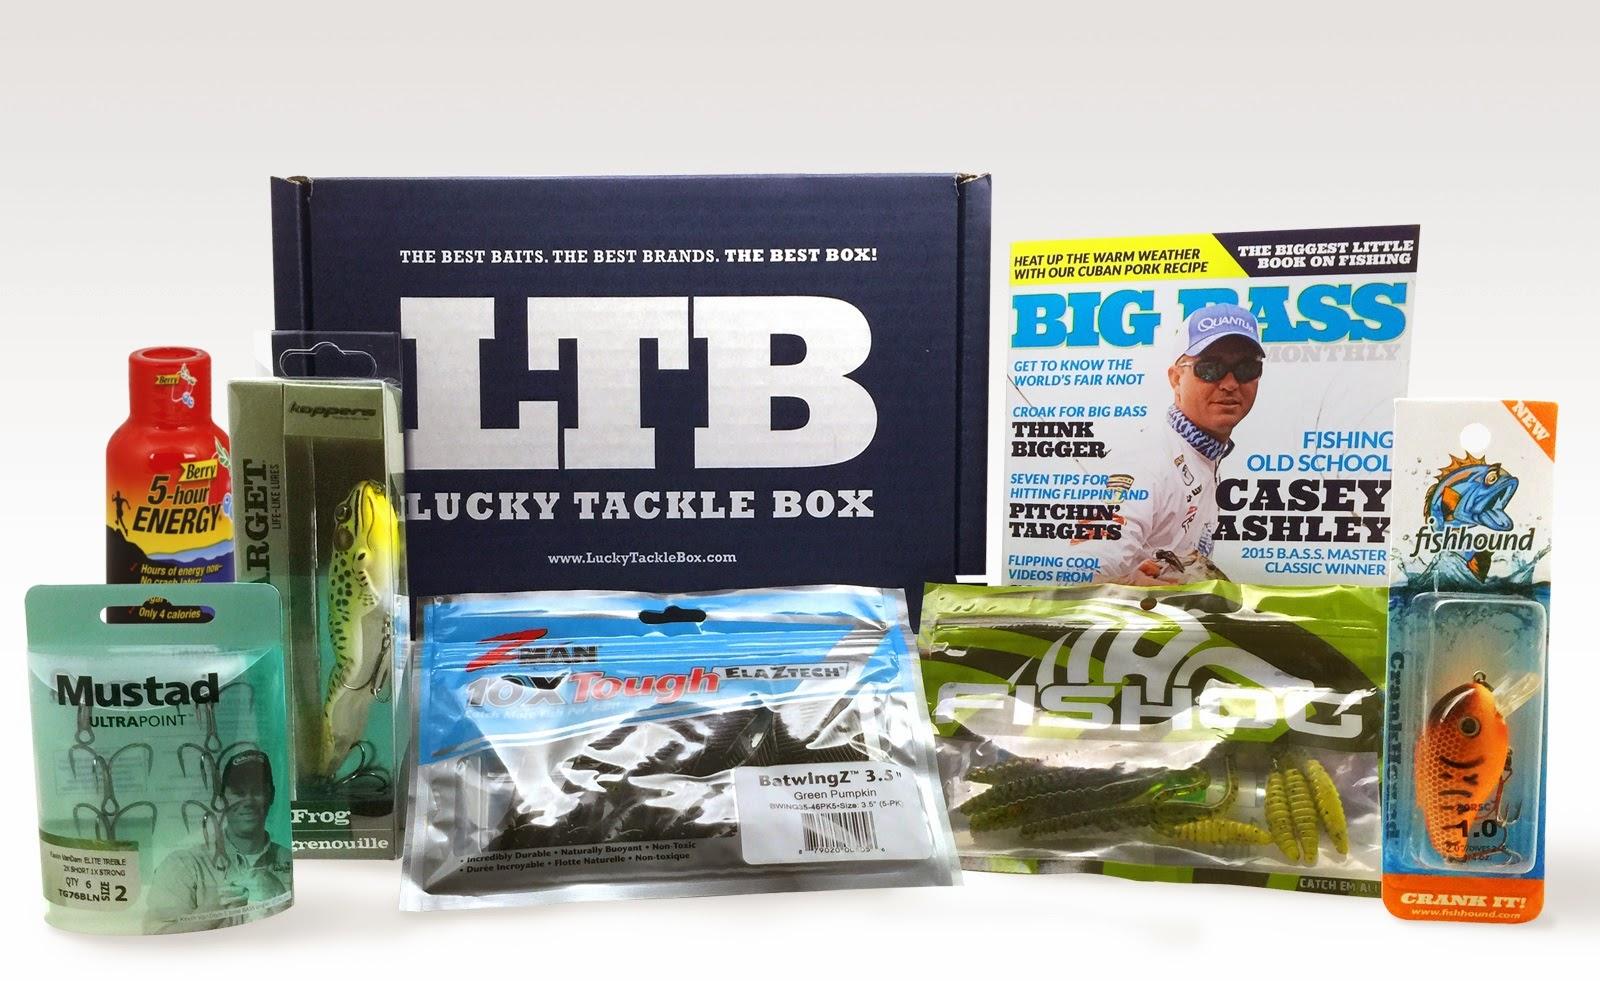 May 2015 lucky tackle box bass fishing lucky tackle box for Bass fishing tackle box